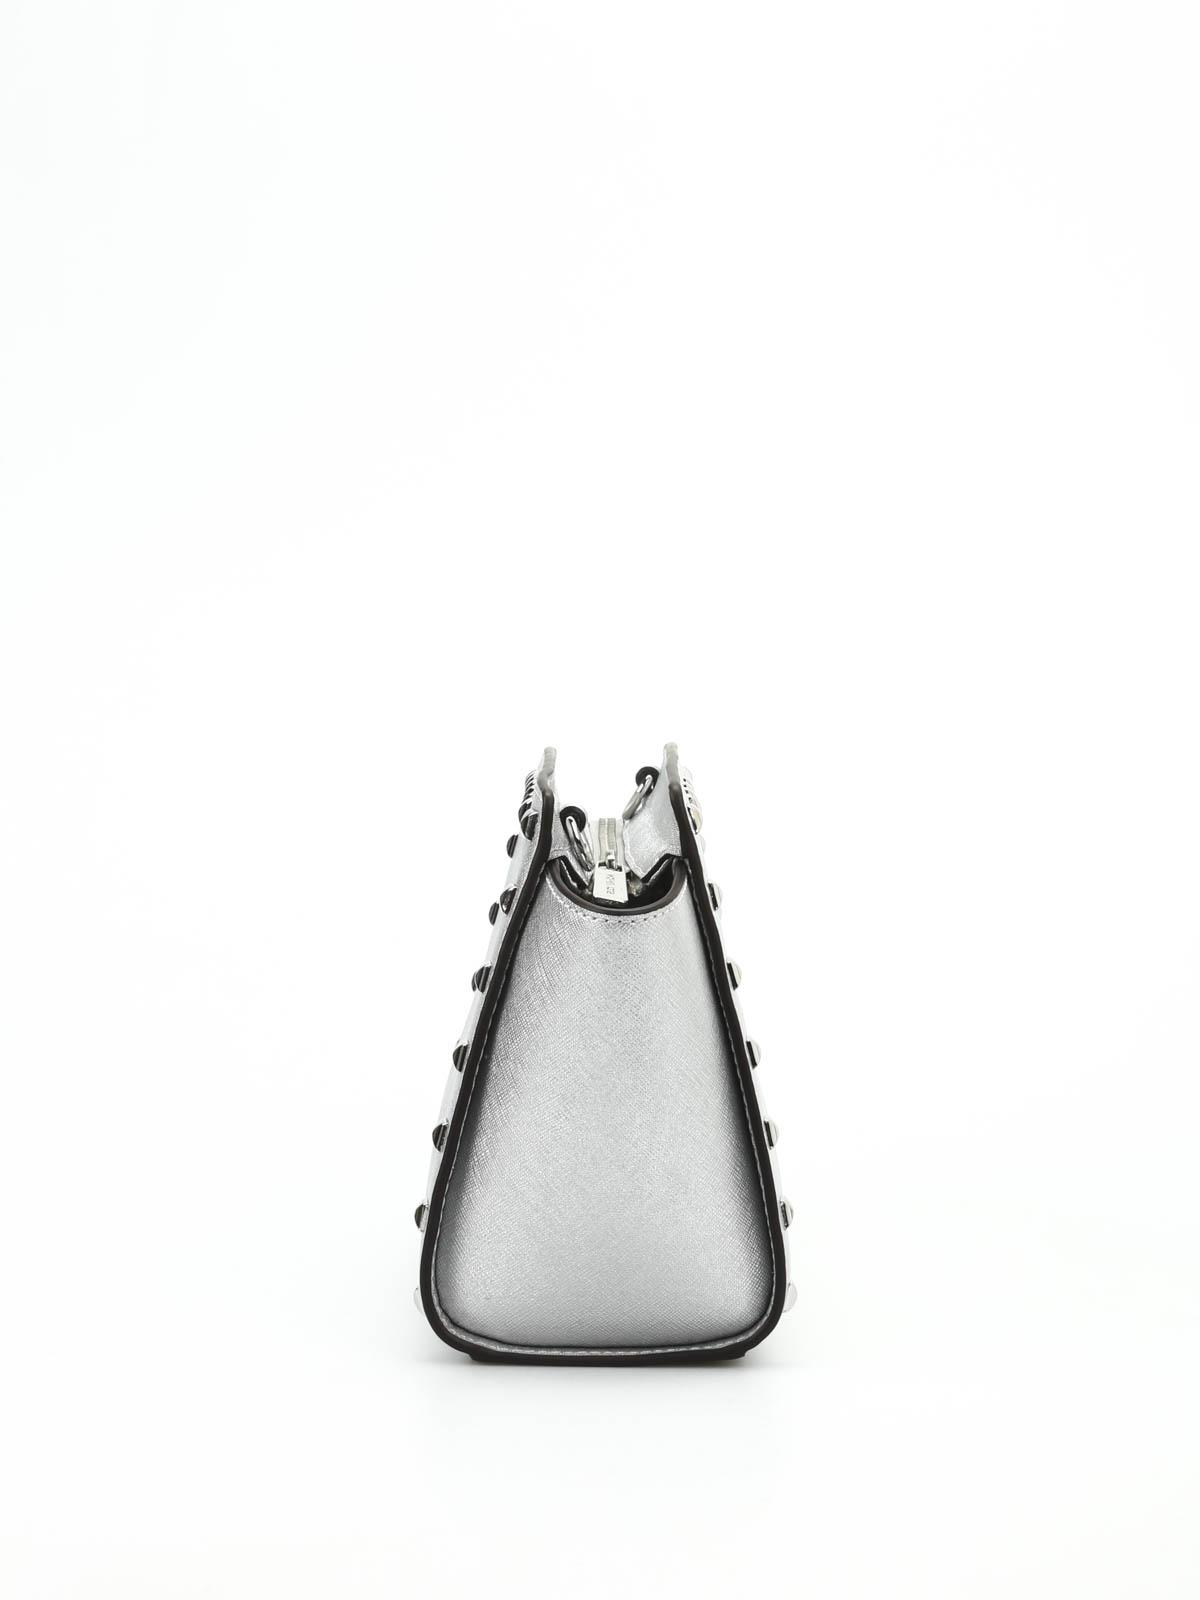 9487a20276bc iKRIX MICHAEL KORS  cross body bags - Studded Selma cross body bag